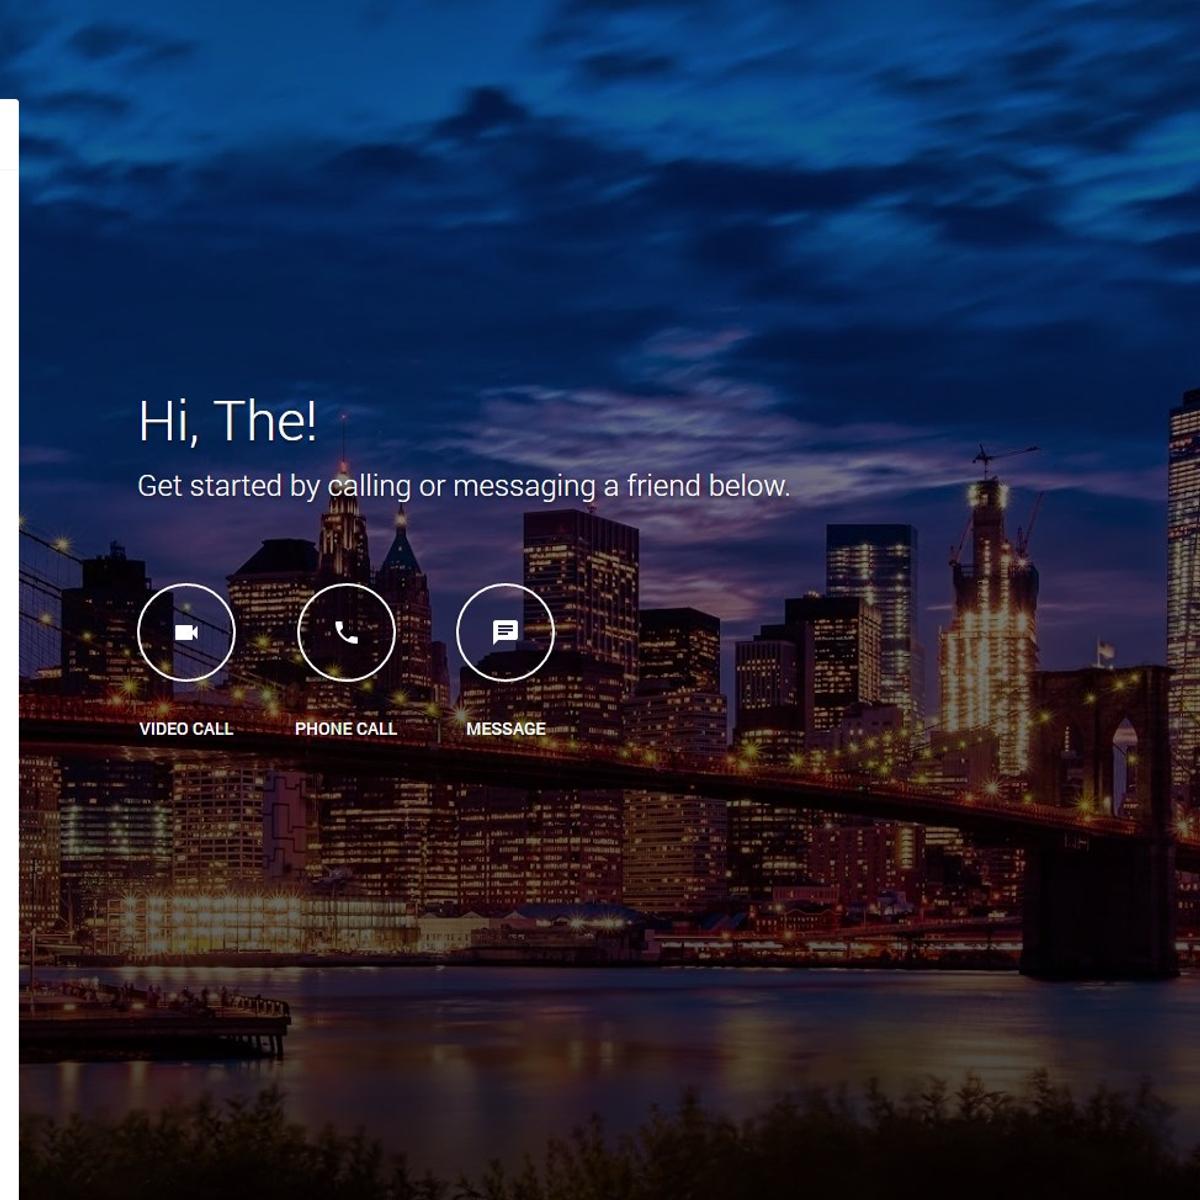 Google hangouts client for windows phone 8 - Google Hangouts Client For Windows Phone 8 48